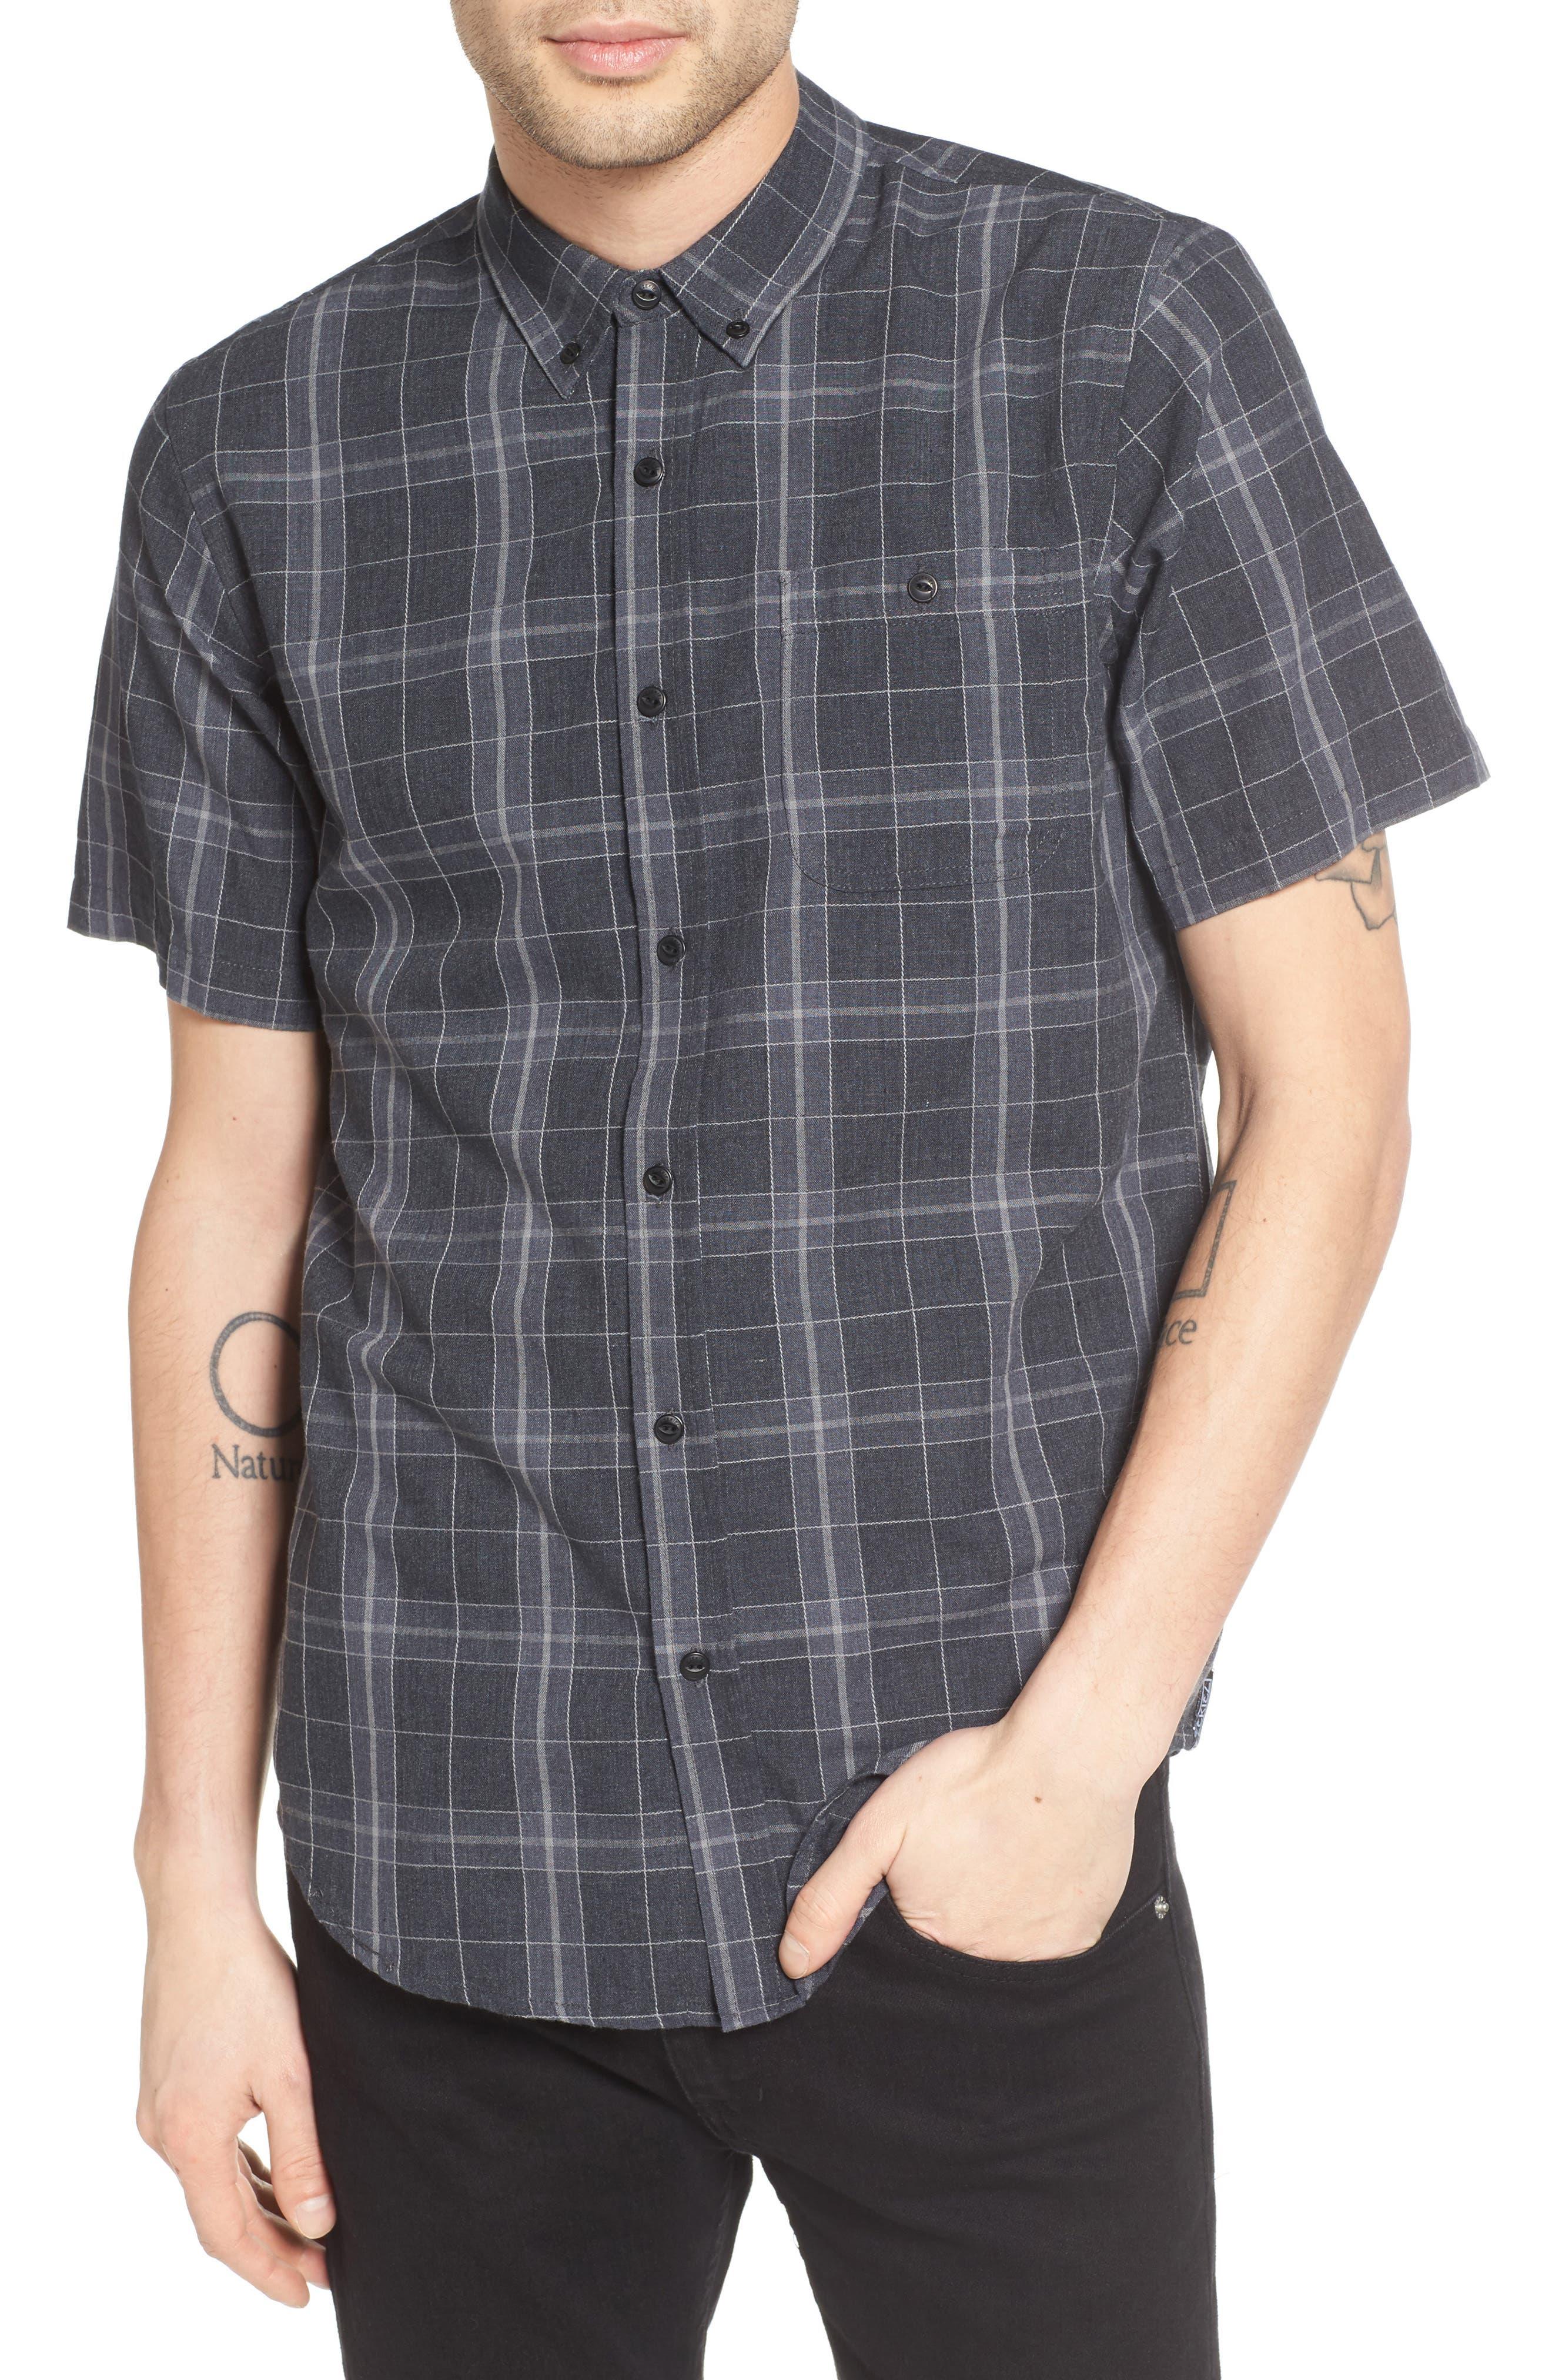 Alternate Image 1 Selected - Ezekiel Plaid Woven Shirt